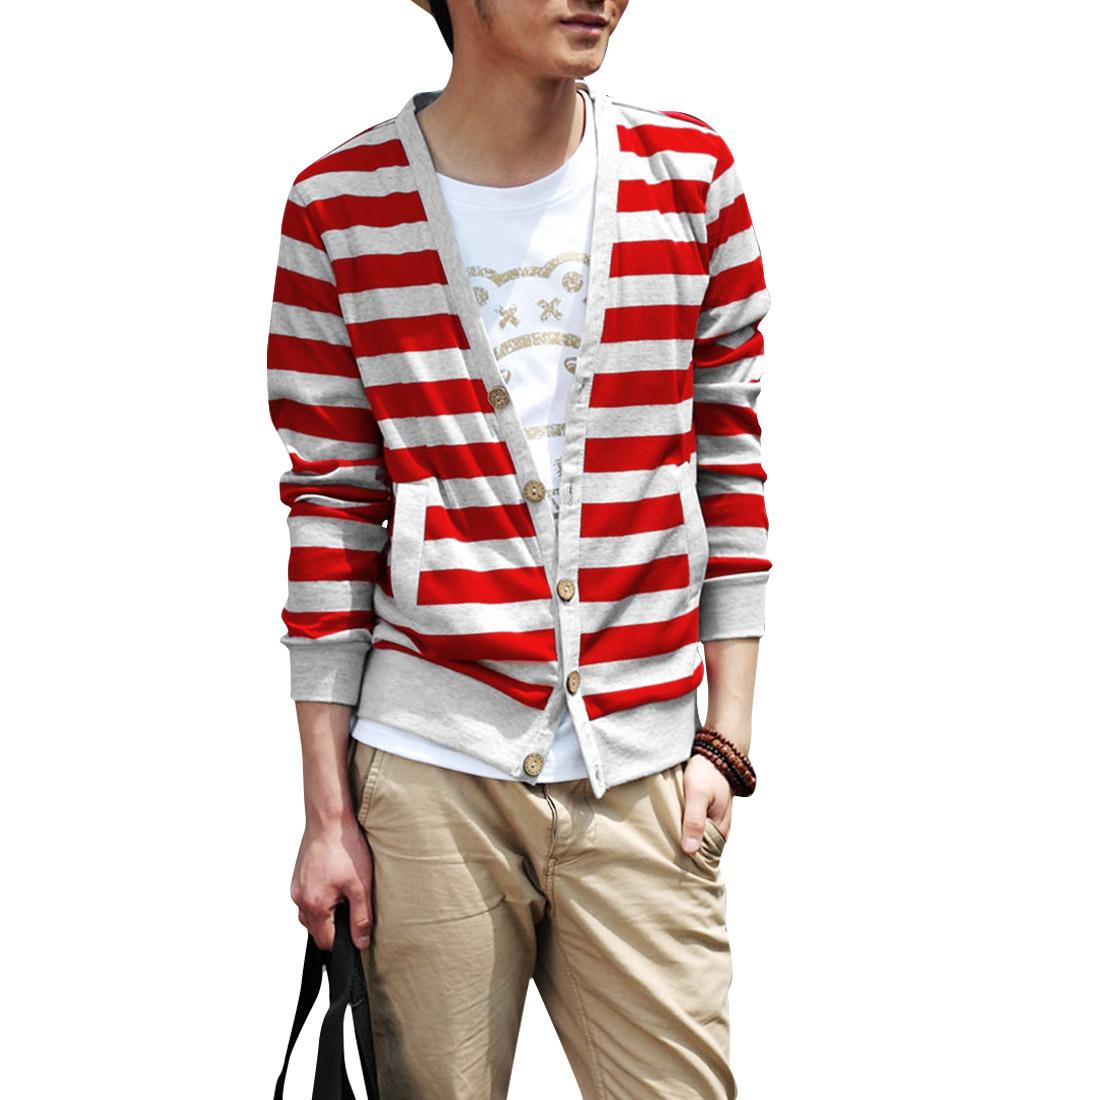 Men V Neck Long Sleeve Casual Knitwear Red Light Gray M